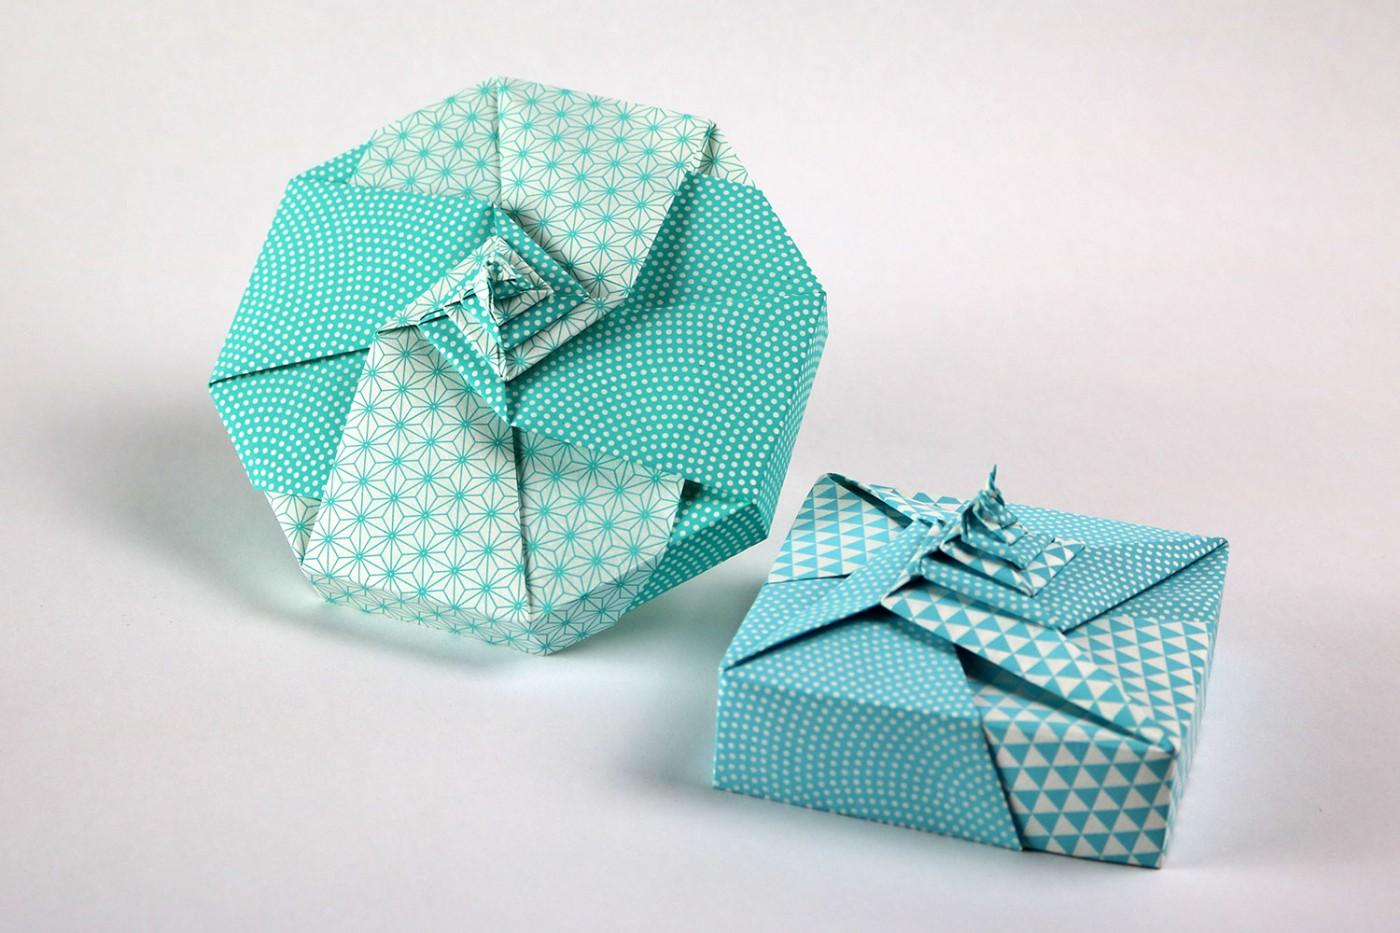 Octagonal Modular Origami Box – Origami Tutorials | 933x1400